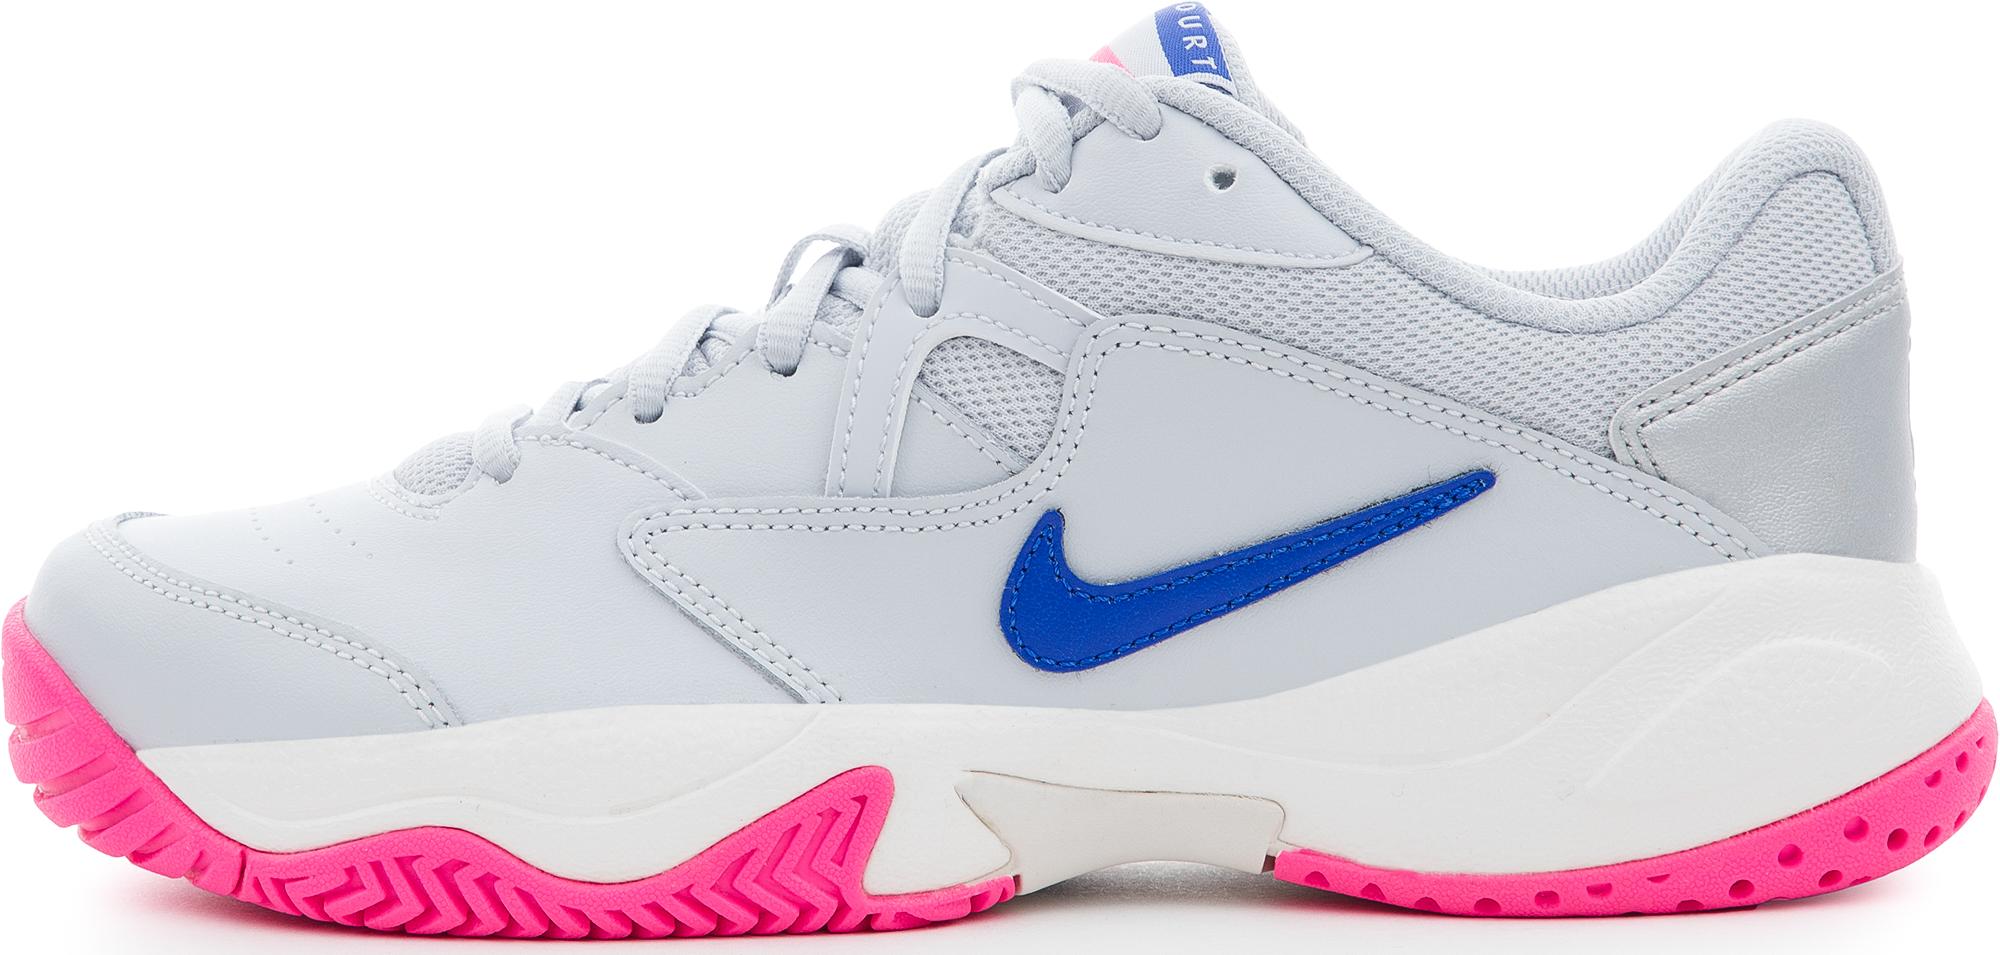 Nike Кроссовки женские Nike Court Lite 2, размер 41 nike носки nike court essentials crew 1 пара размер 37 41